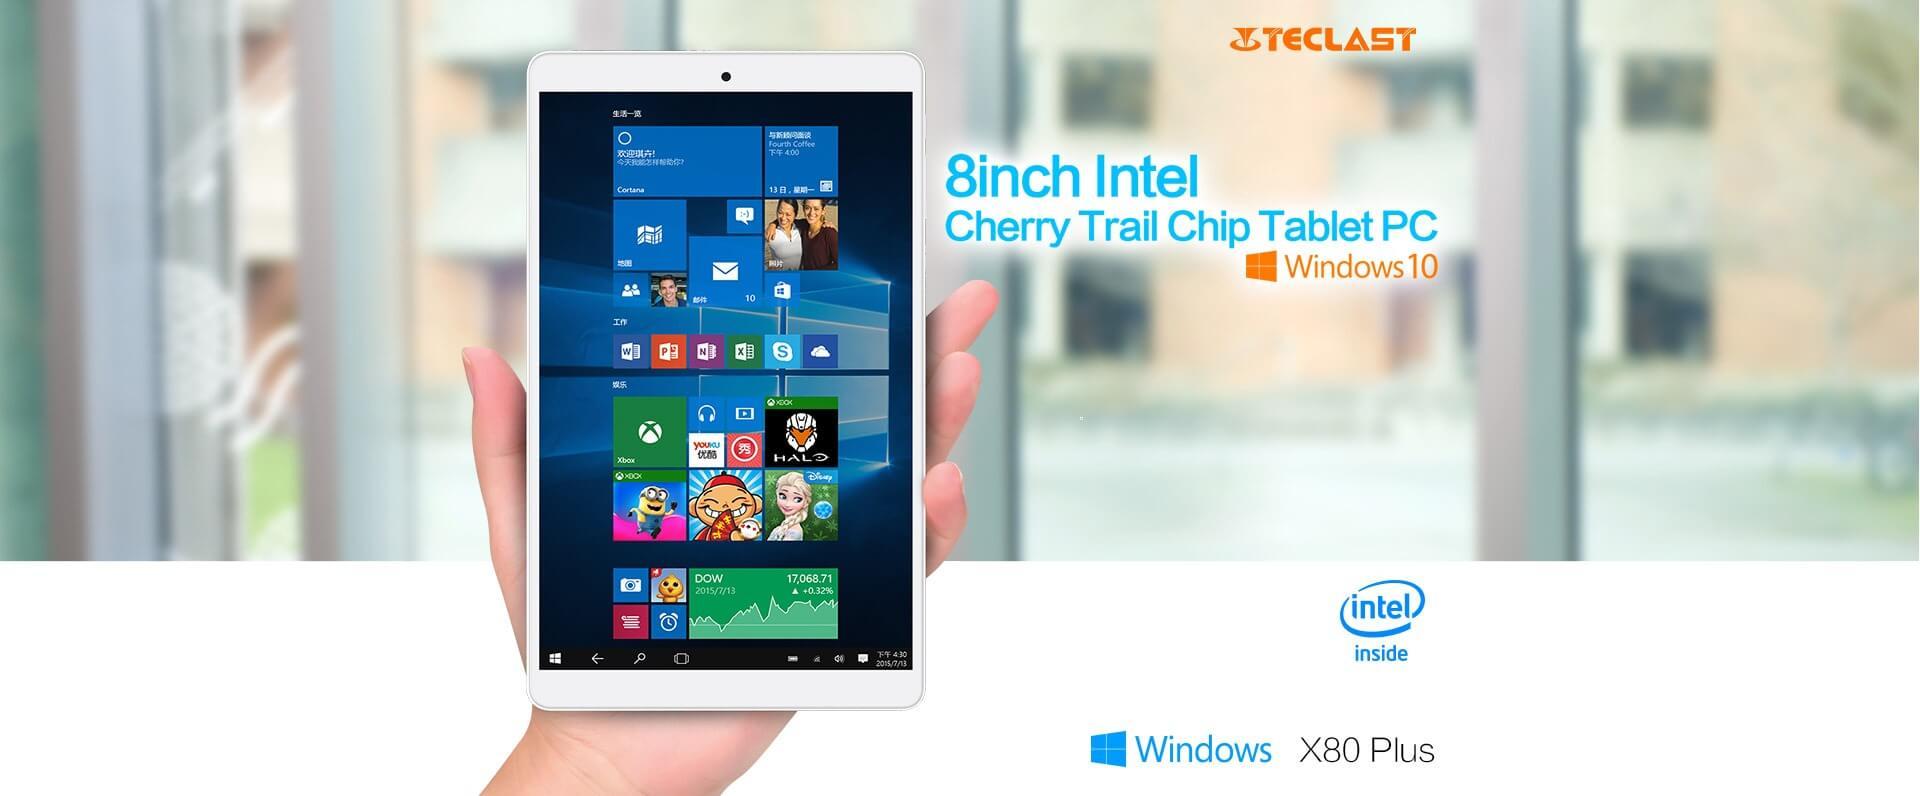 Teclast-X80-Plus-1458576345-0-0